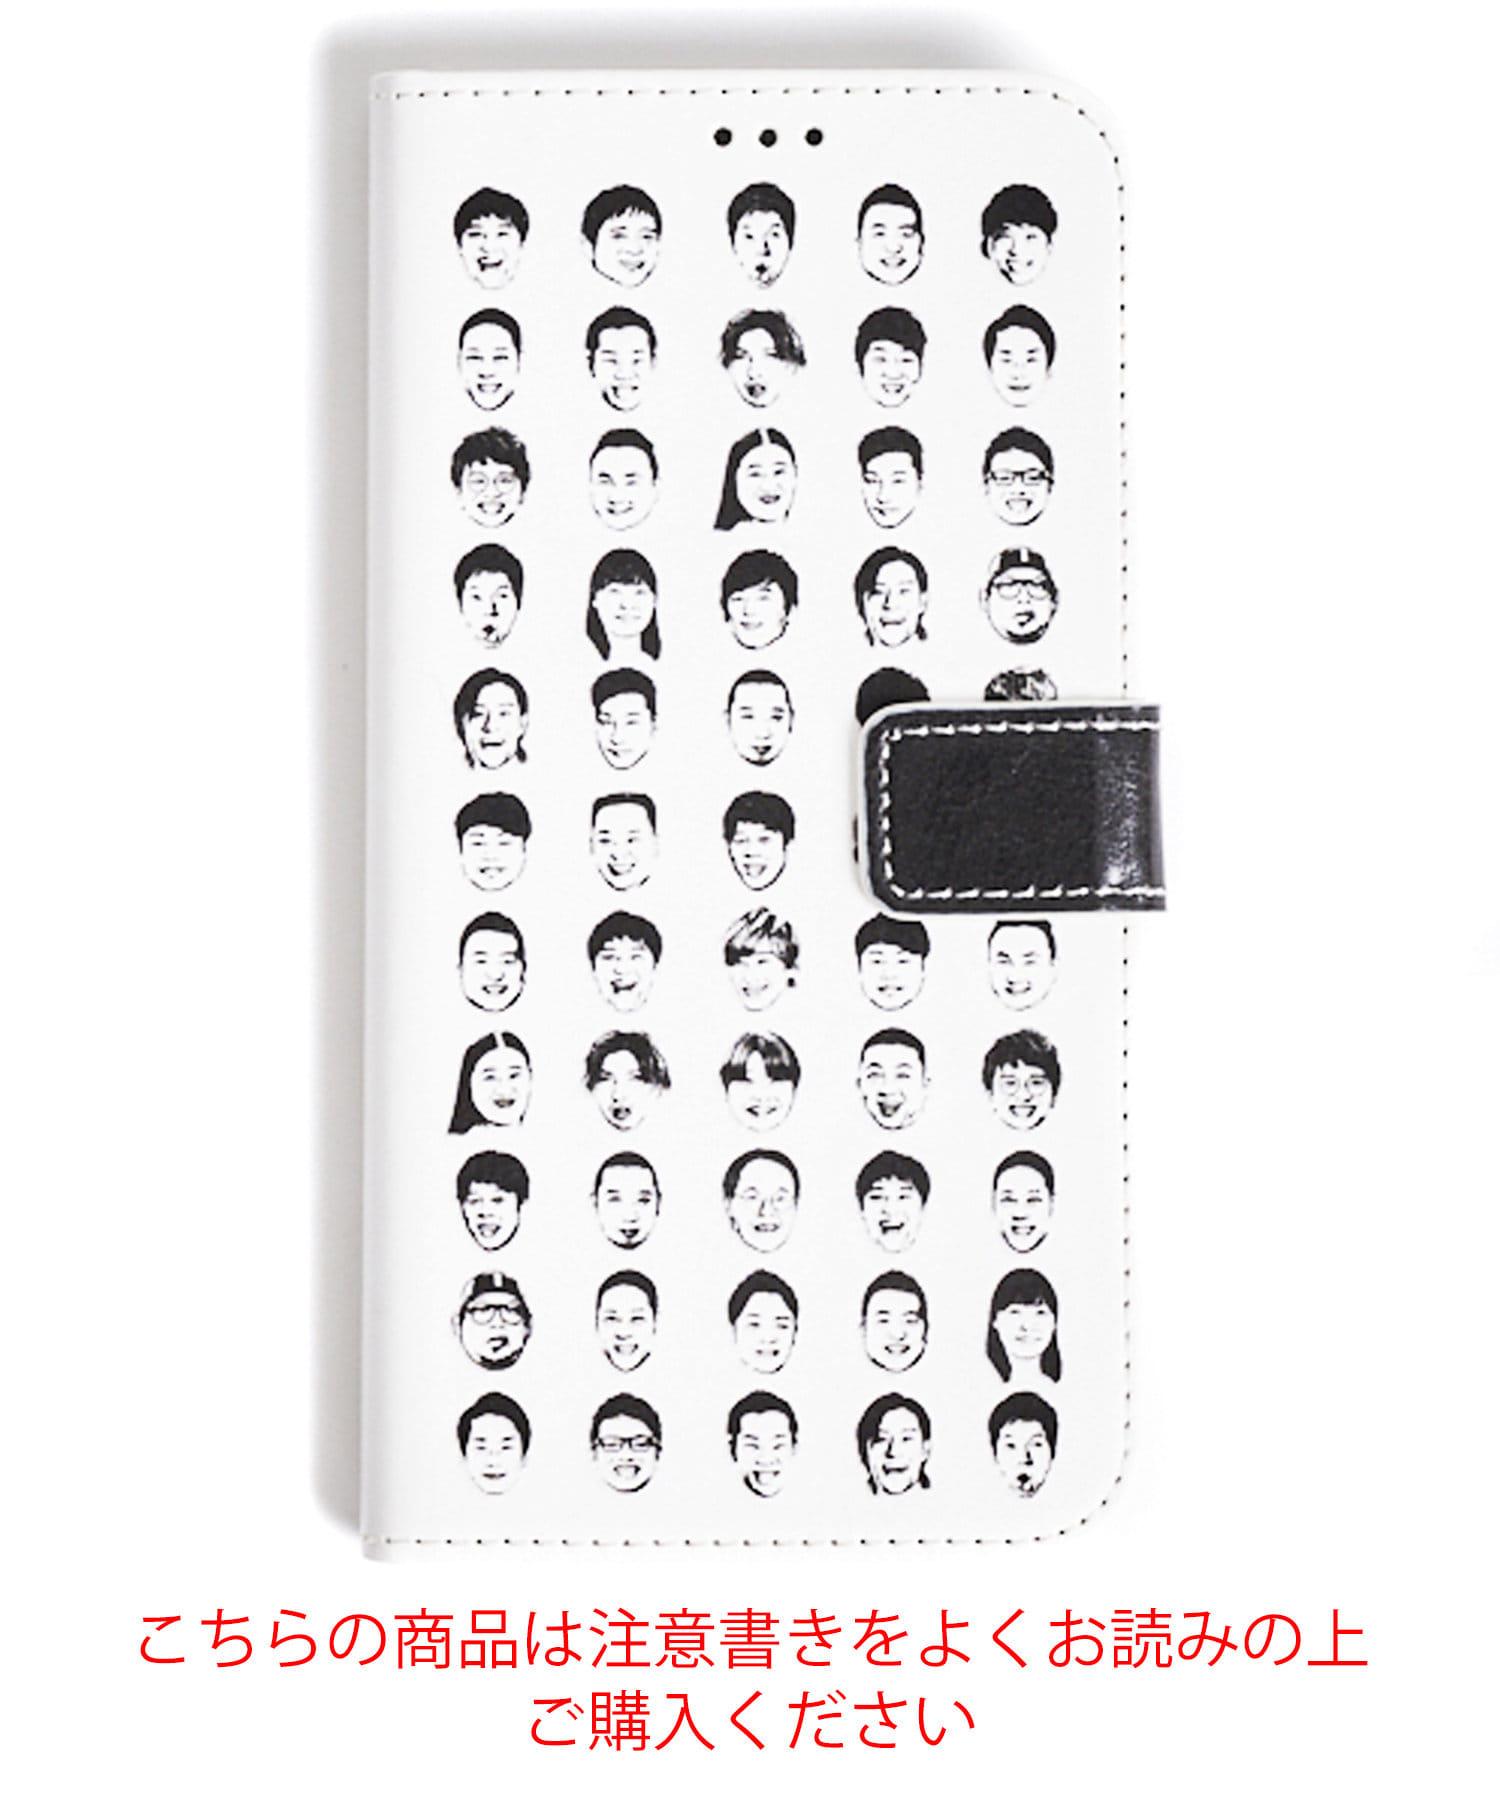 ASOKO(アソコ) ライフスタイル 【YOSHIMOTO】iPhone11ケース<buggy> その他